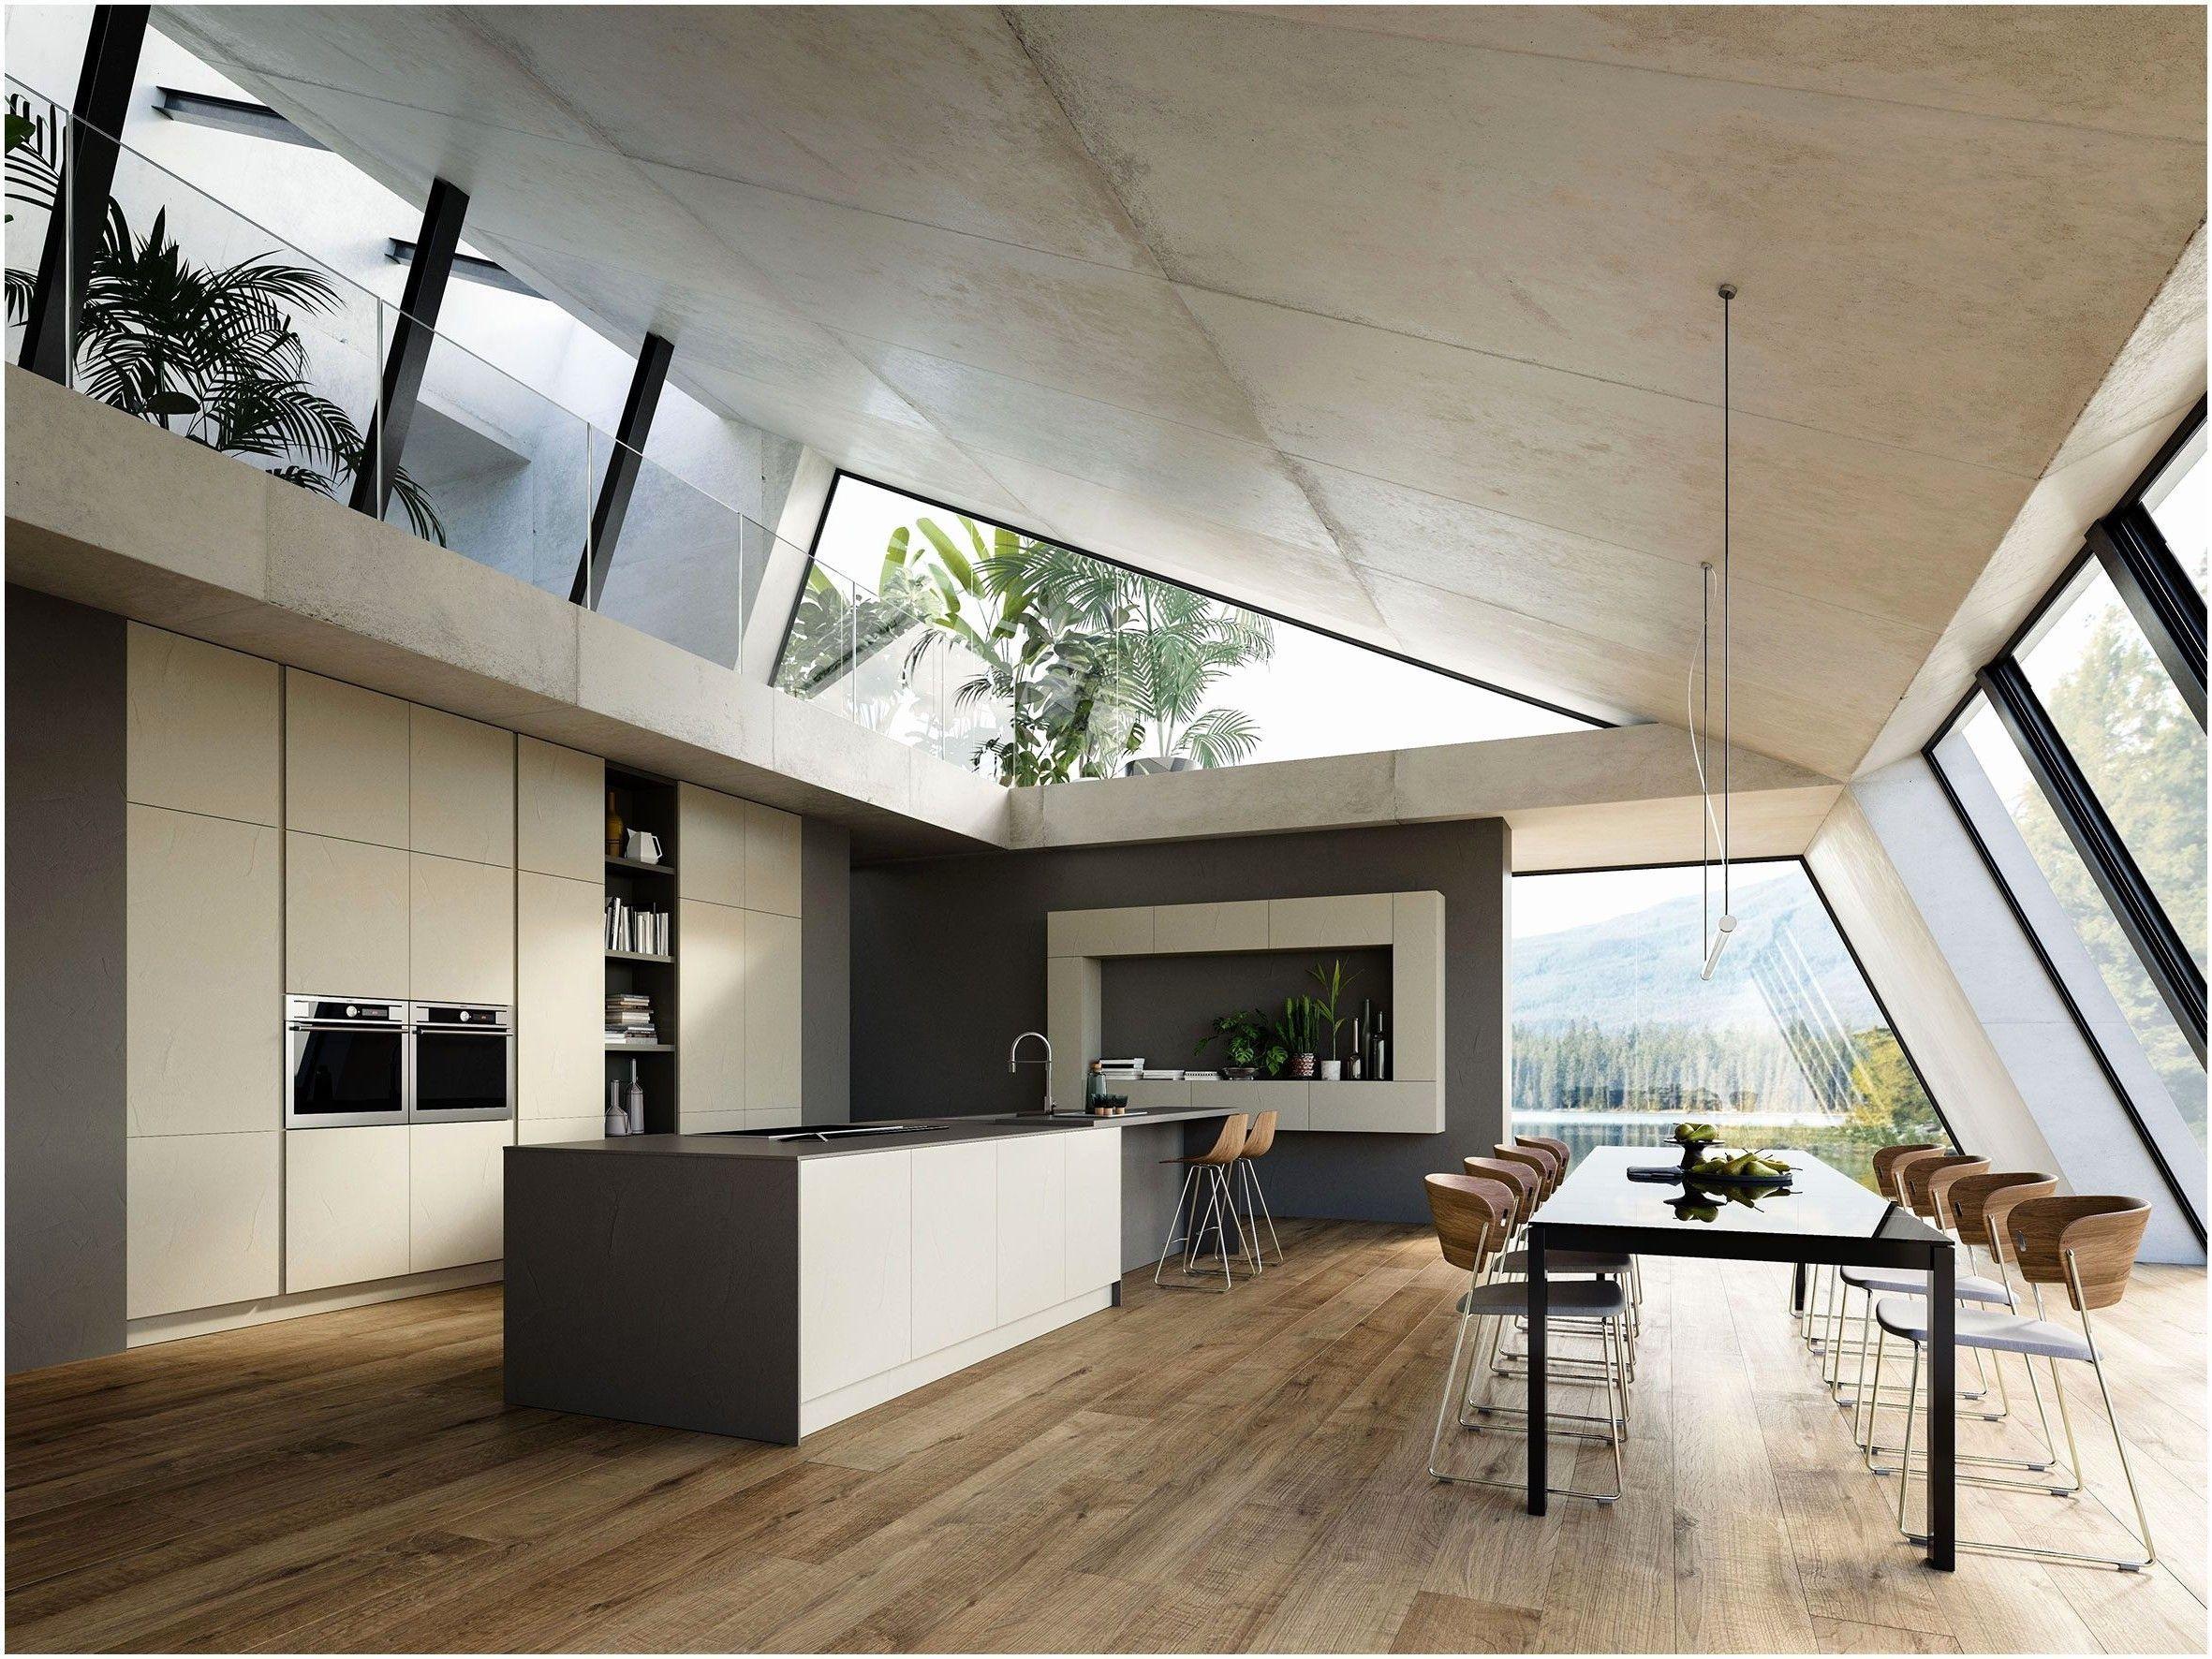 Inspirational Villa Luxe Moderne Interieur   Location de meubles ...